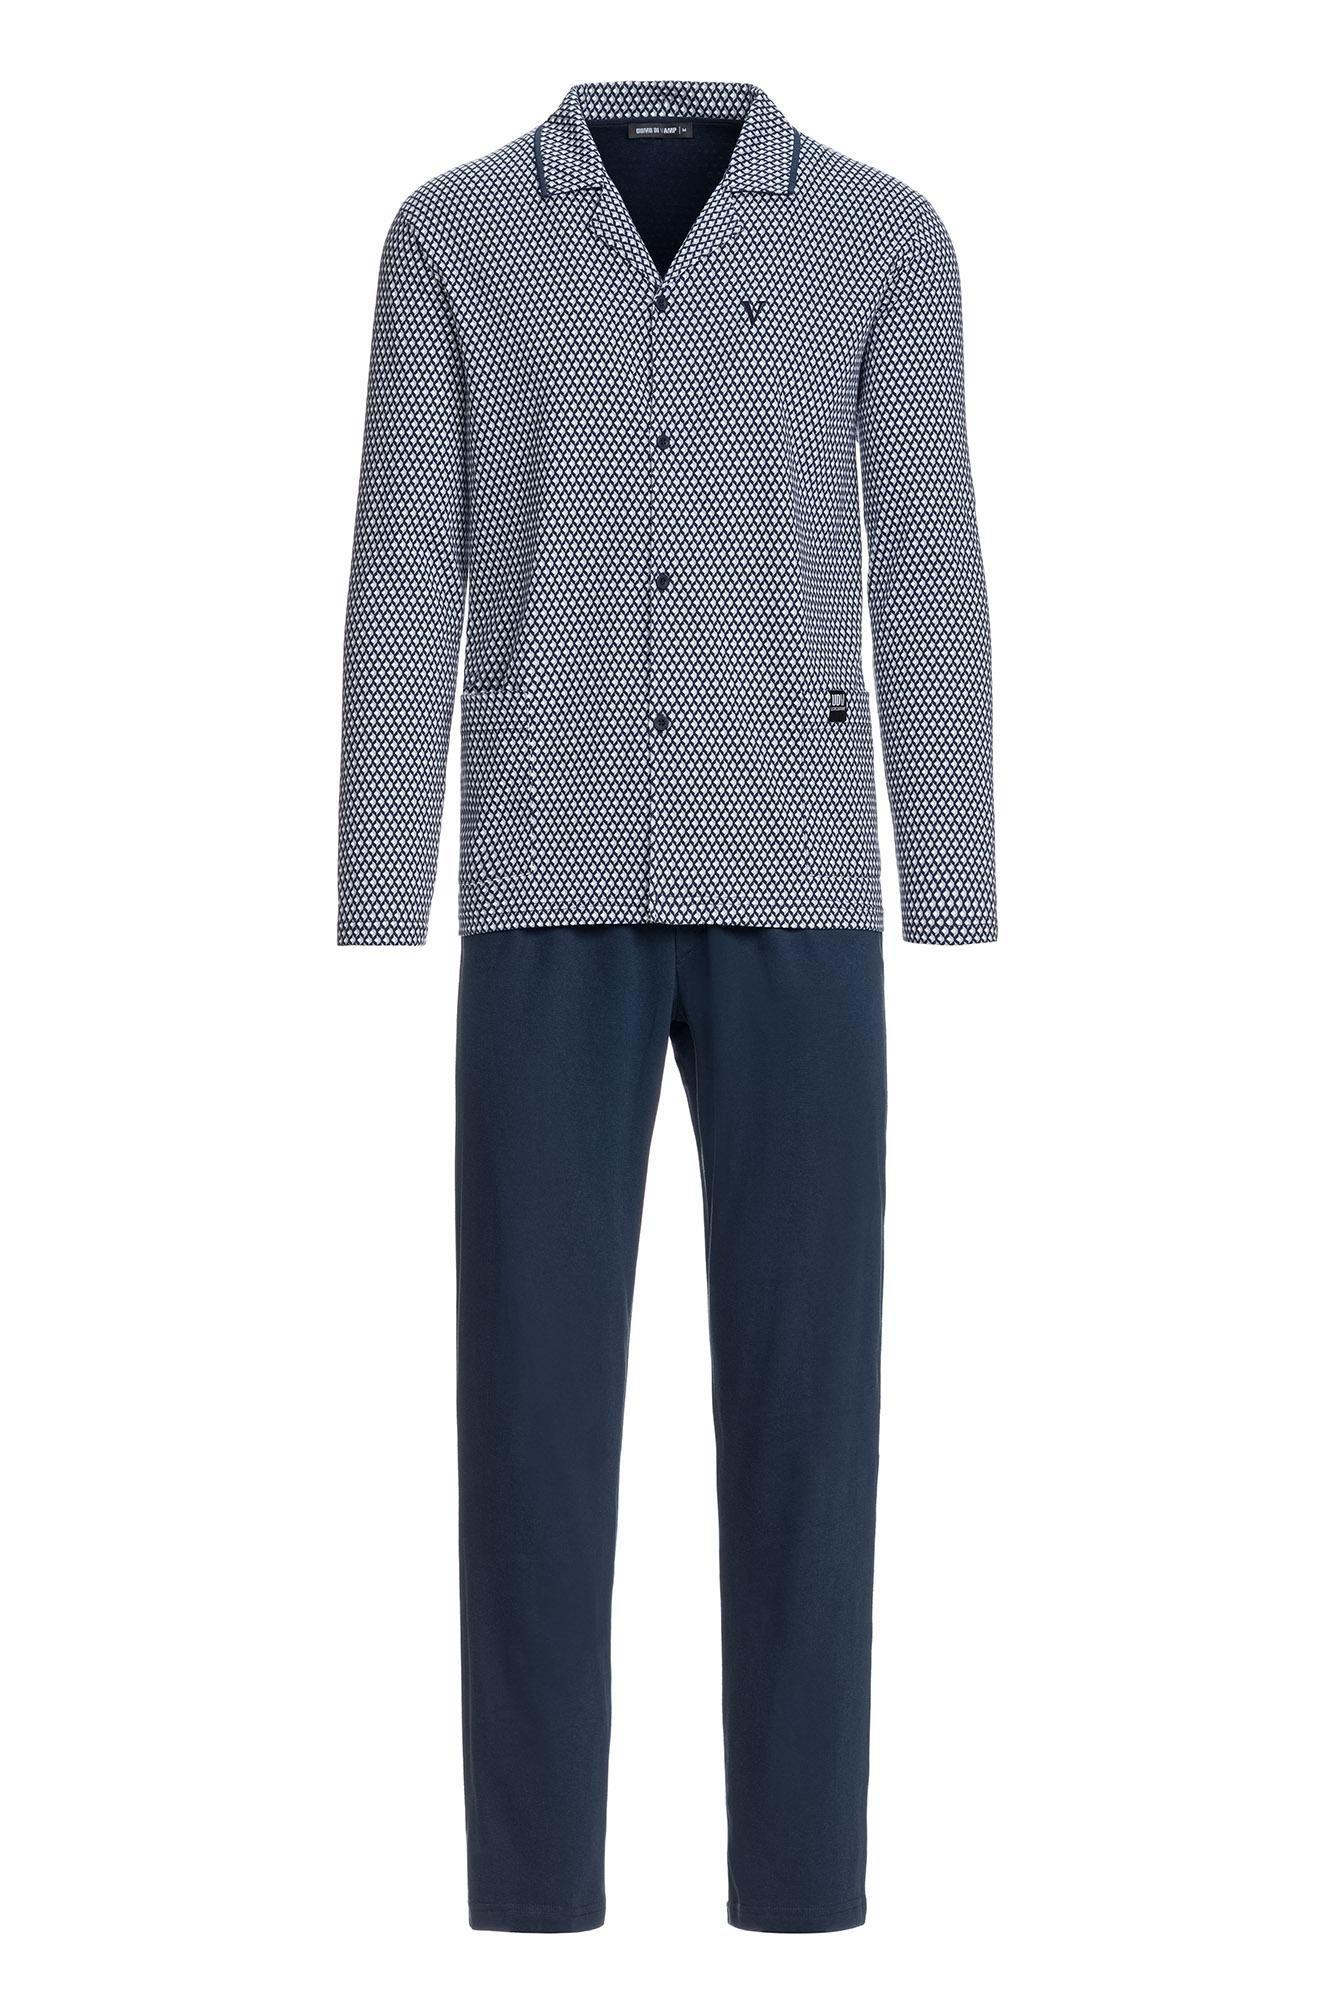 Men's Patterned Buttoned Pyjamas